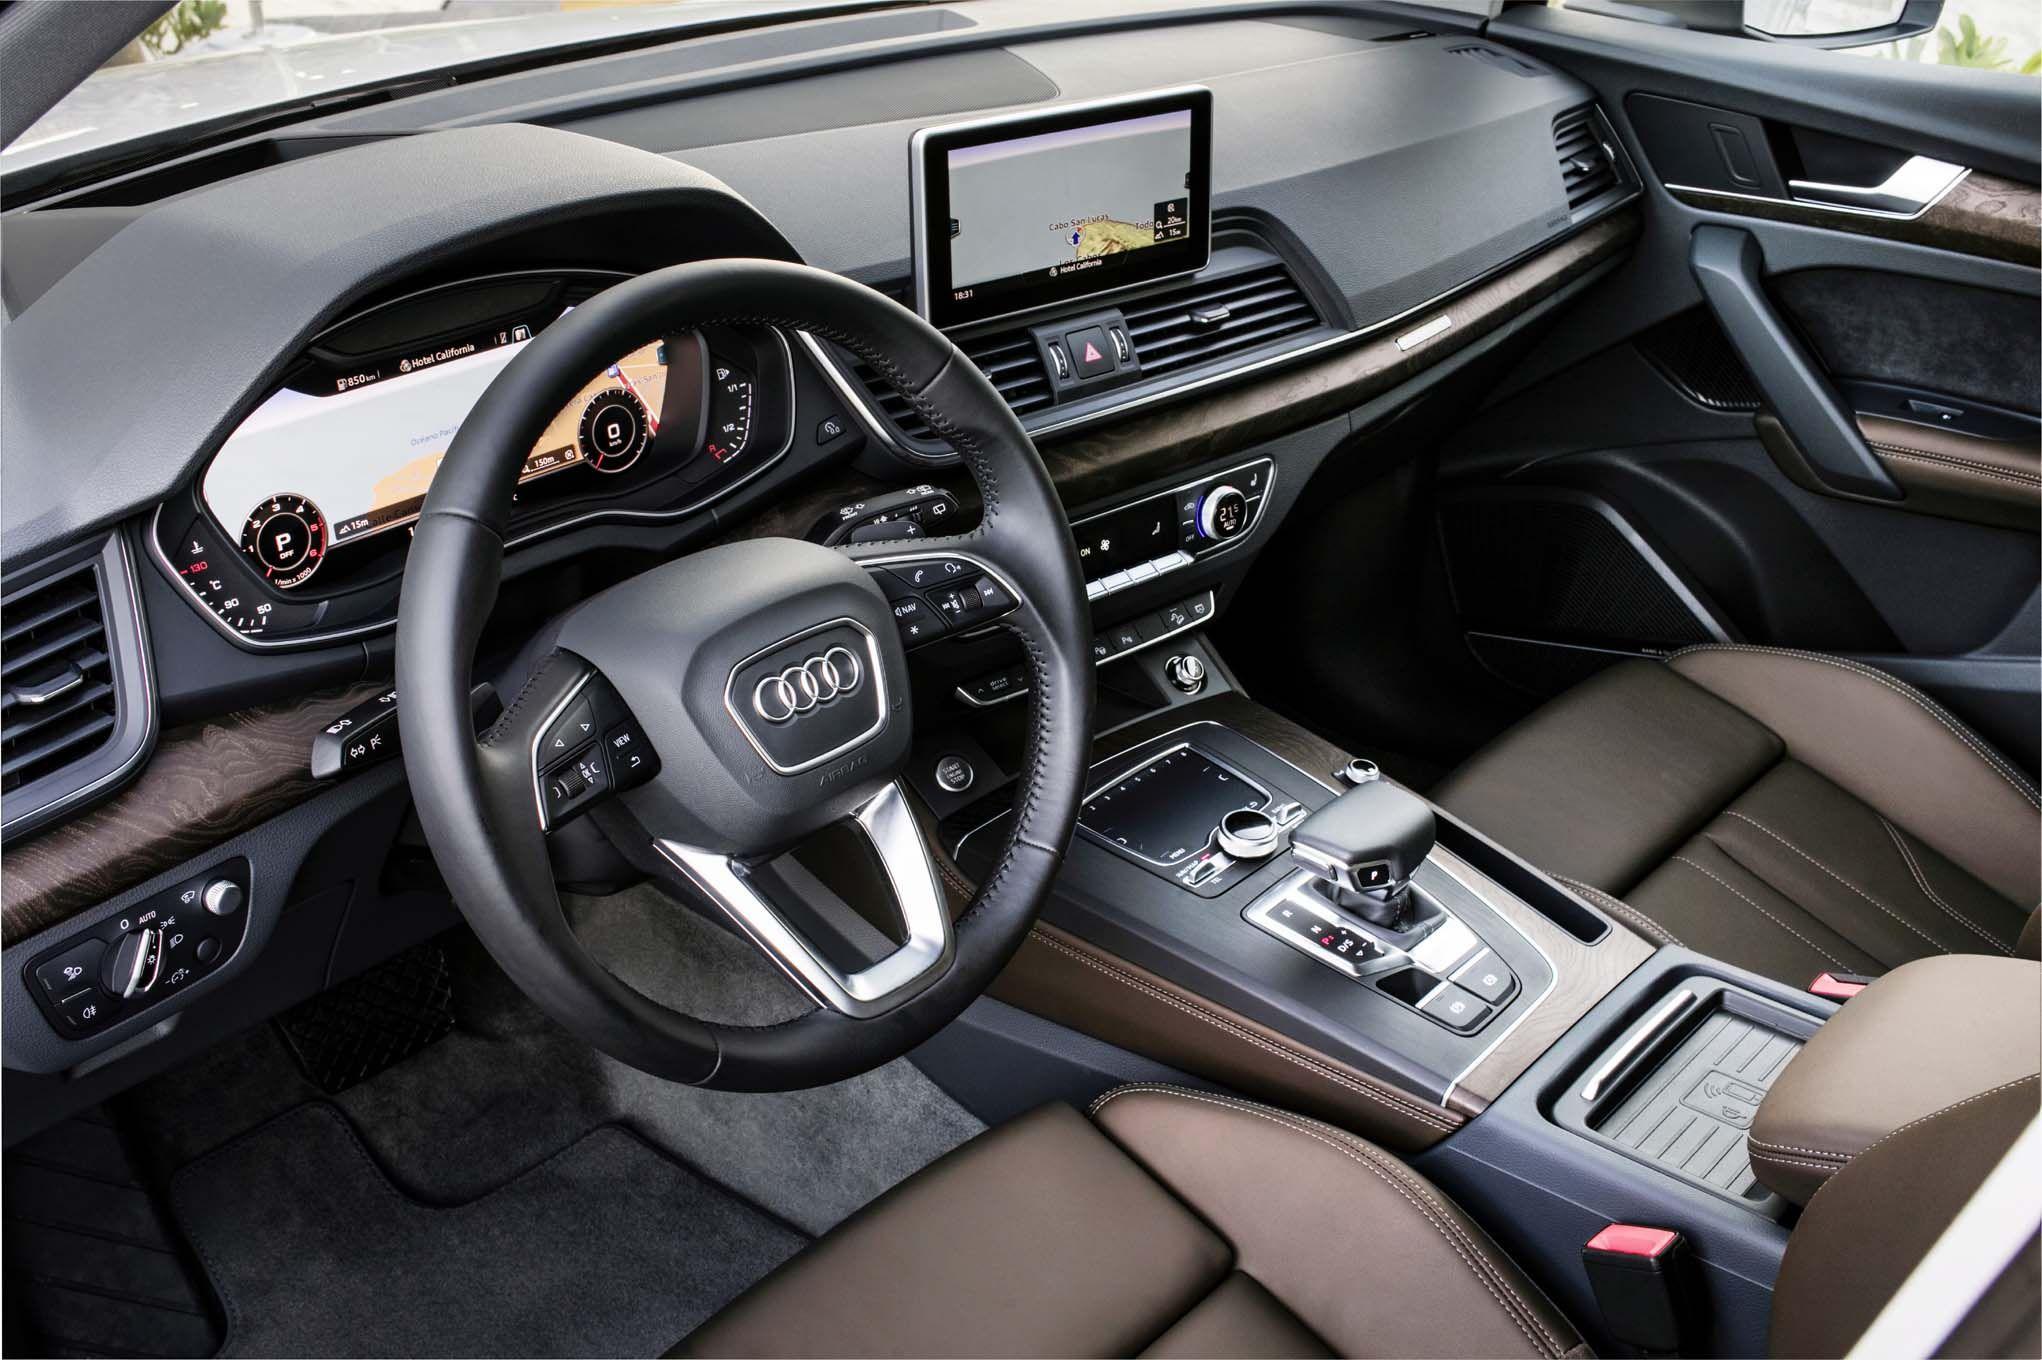 2018 Audi Q5 Interior Euro Specs Tdi Sportback Suv